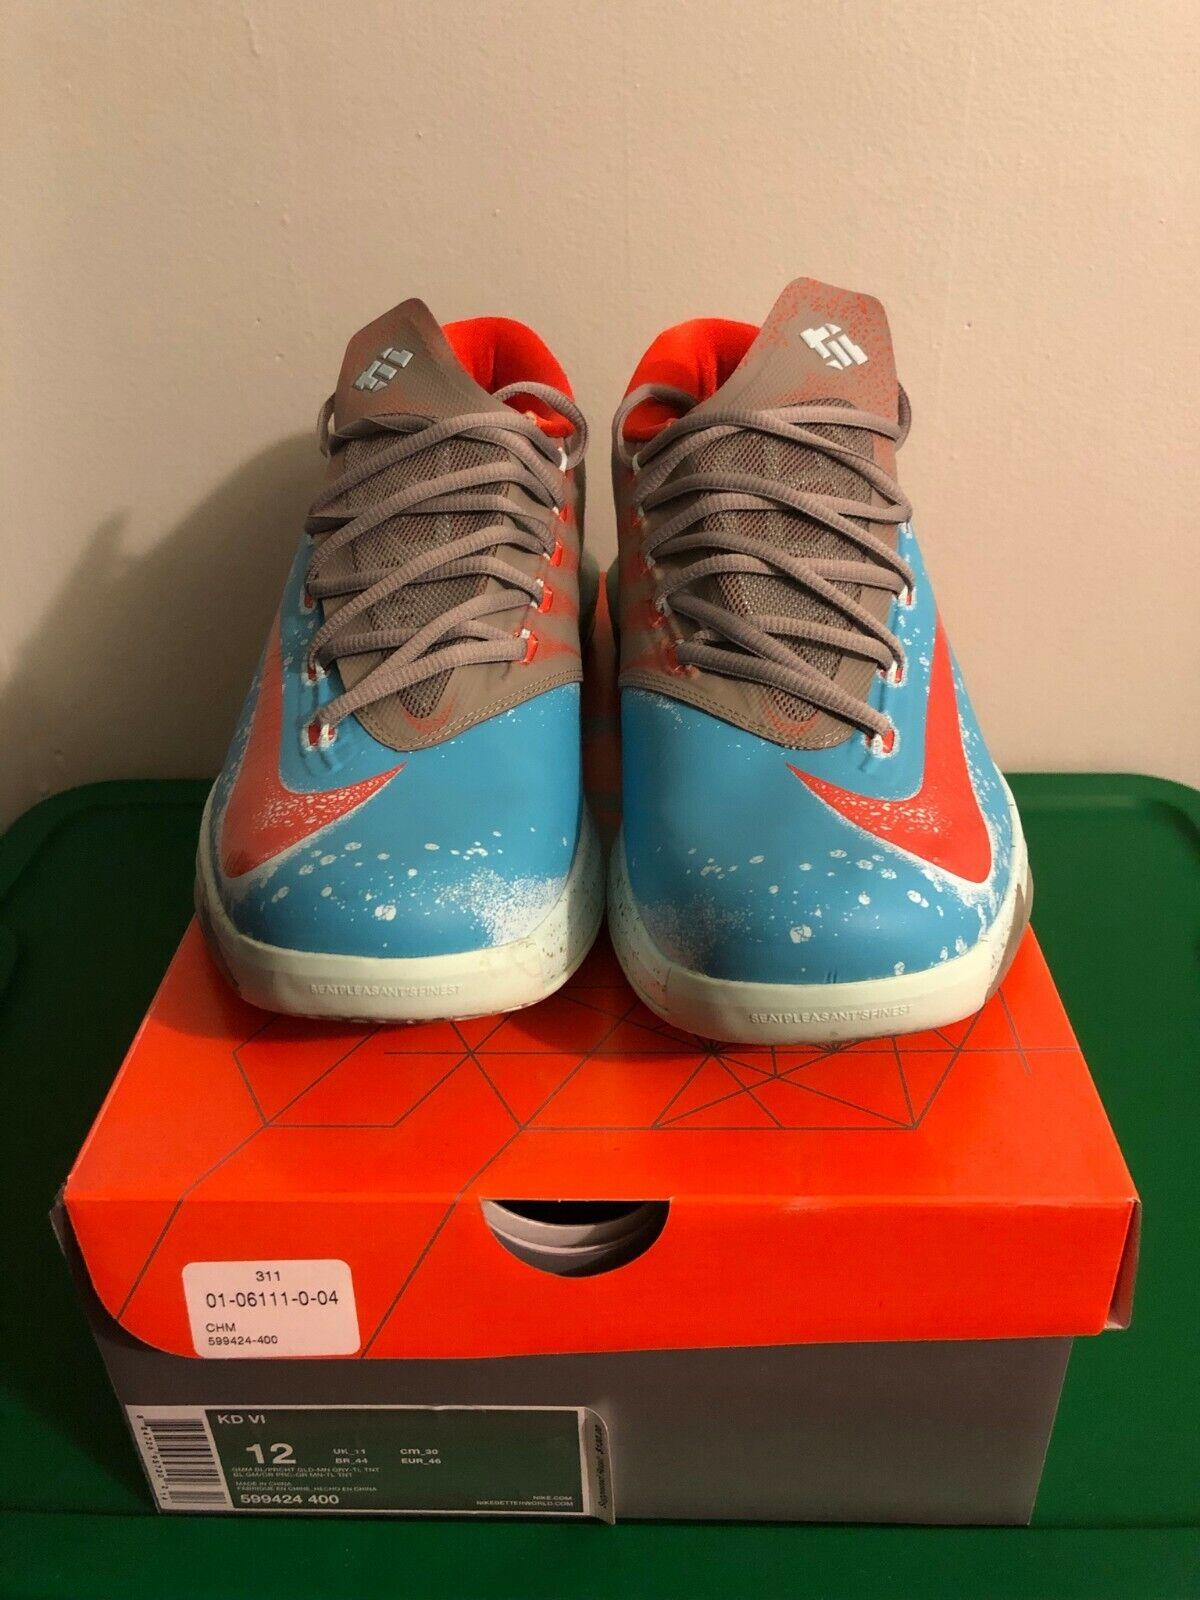 Nike Kevin Durant KD 6 VI bluee Crab Gamma bluee 12 9 10 599424-400